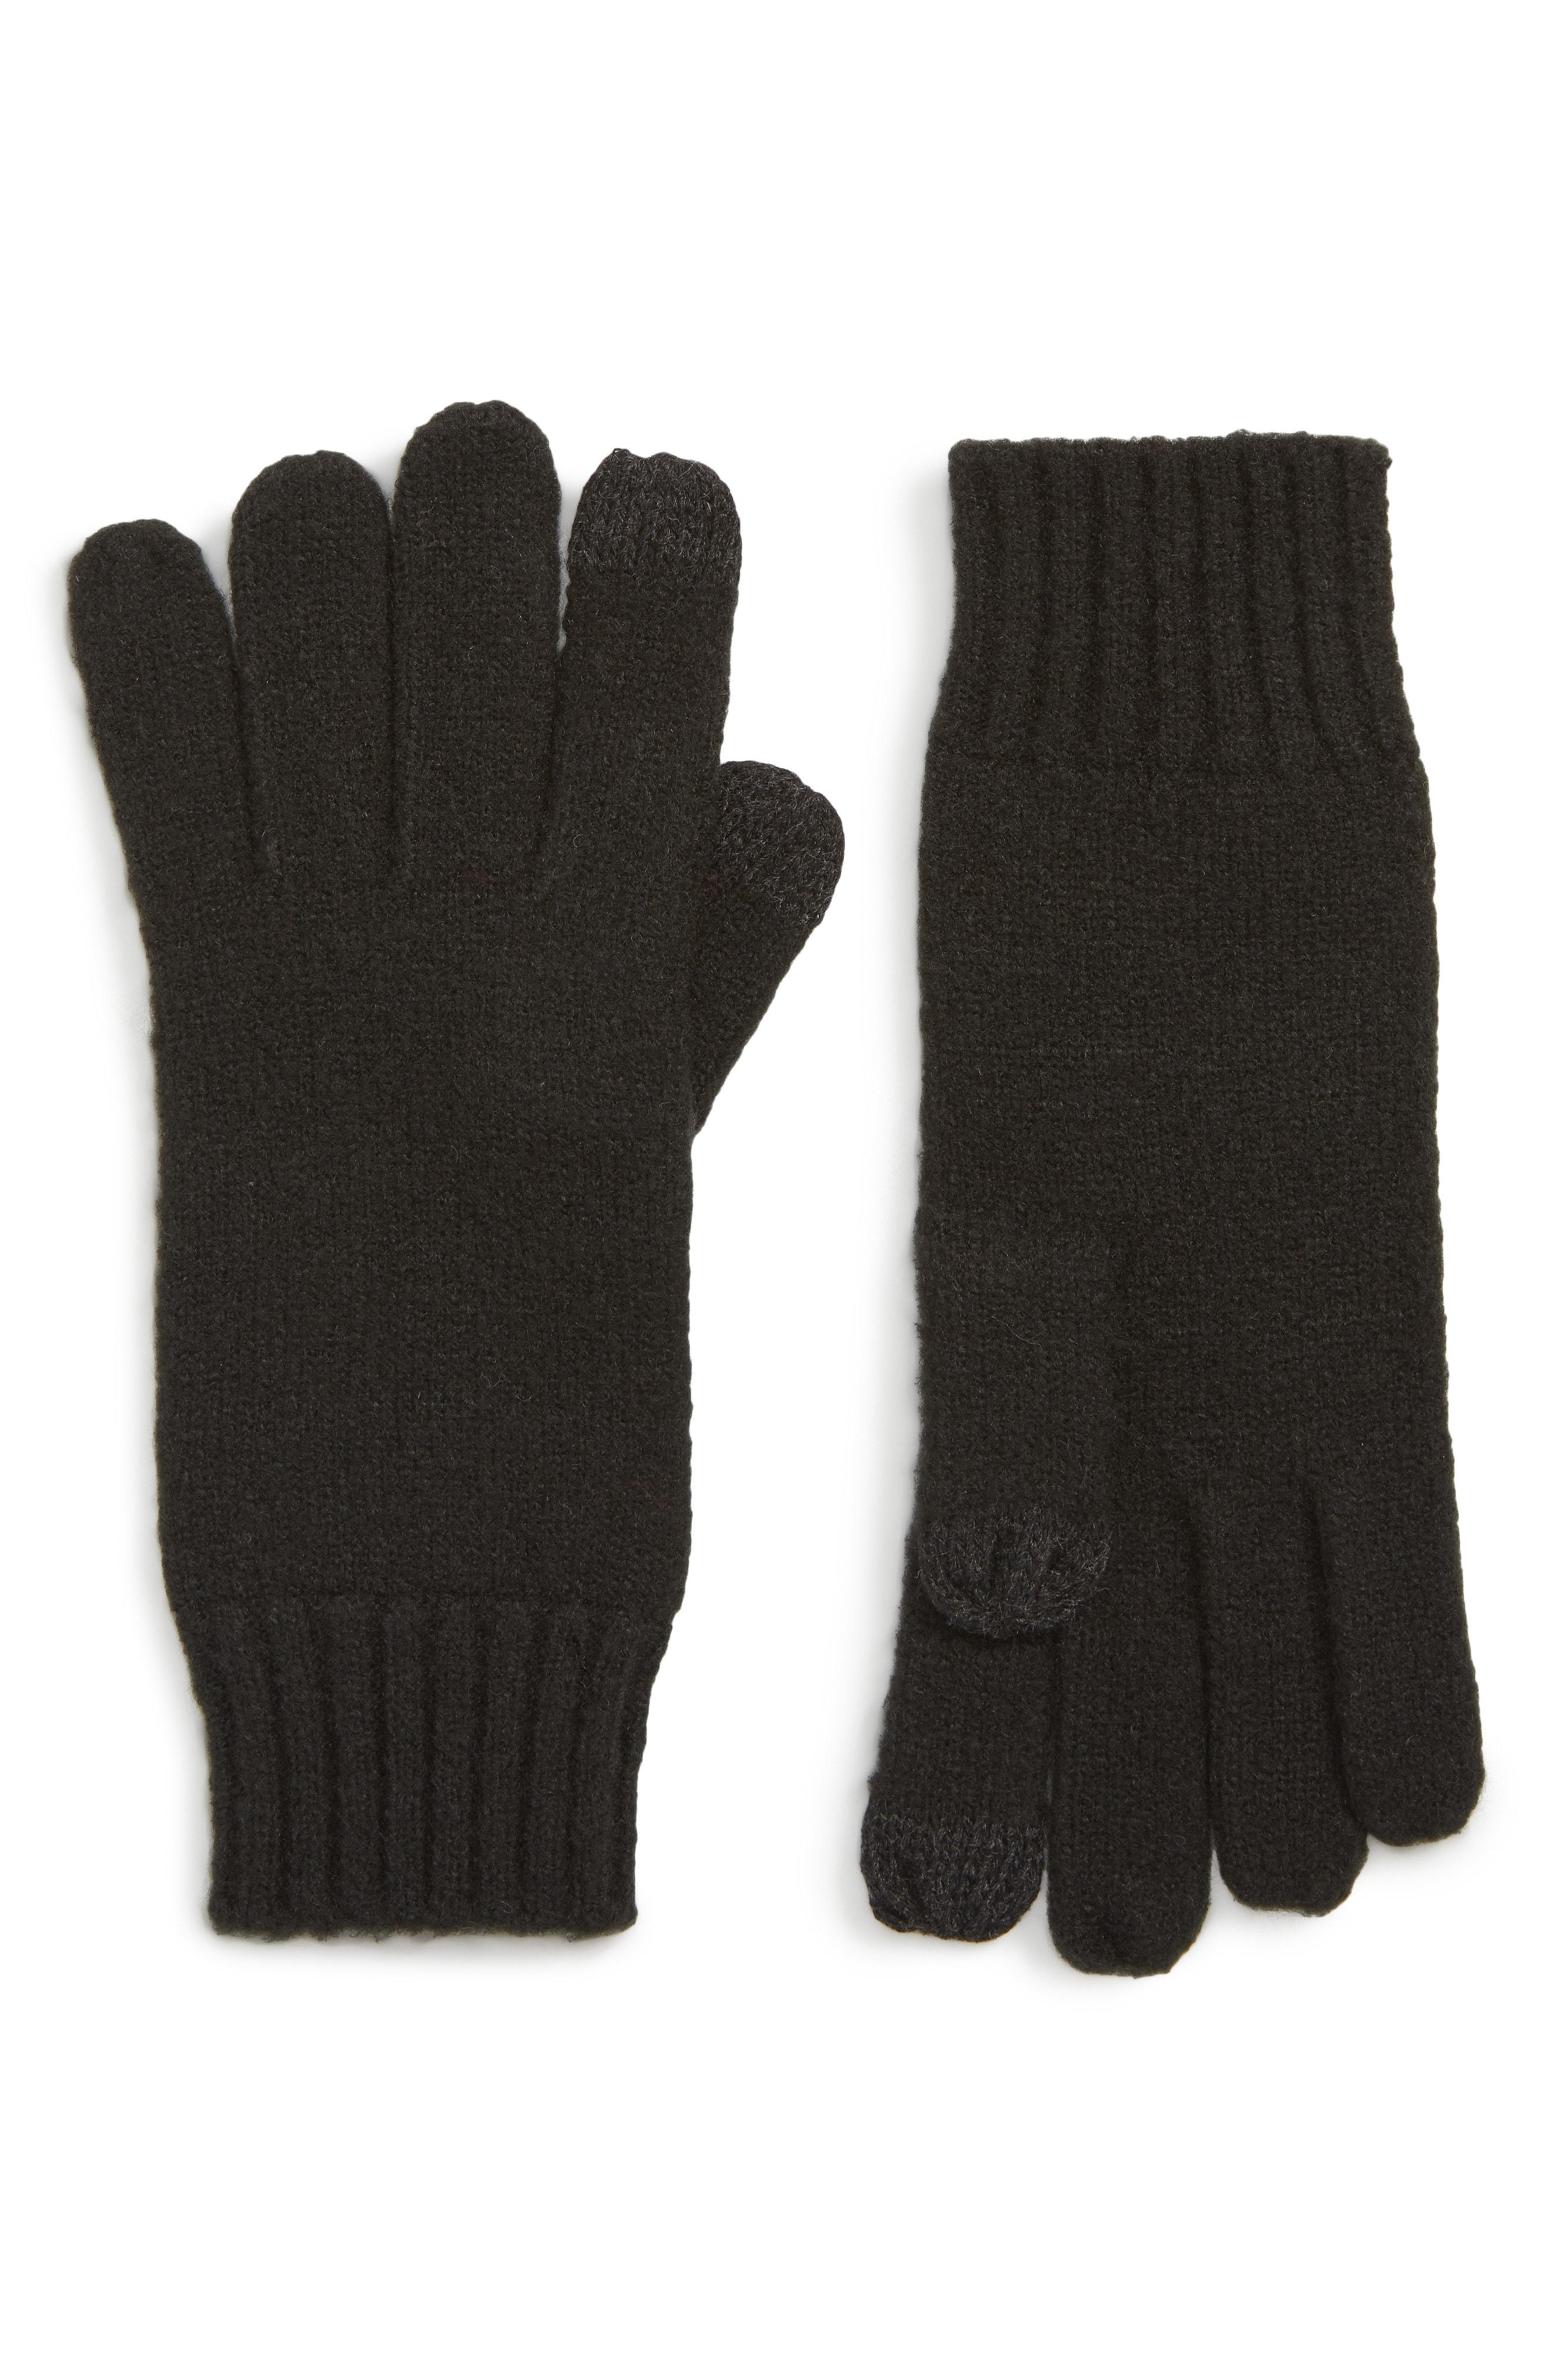 Nordstrom Knit Tech Gloves